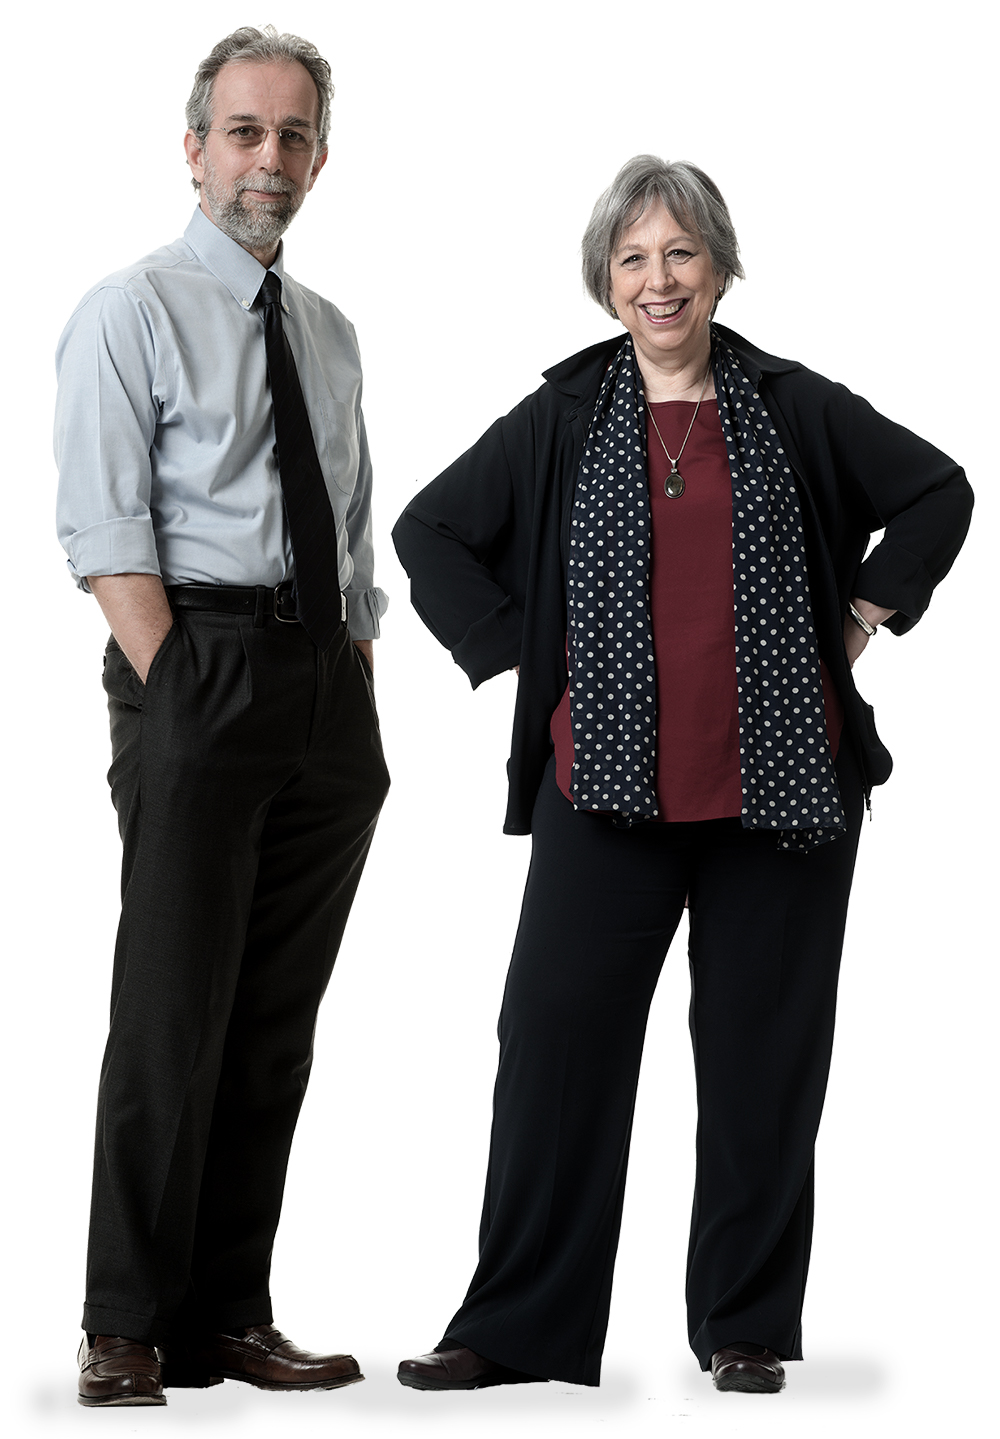 Guido e Bianca Biscione, i fratelli che gestiscono Biscione Associati